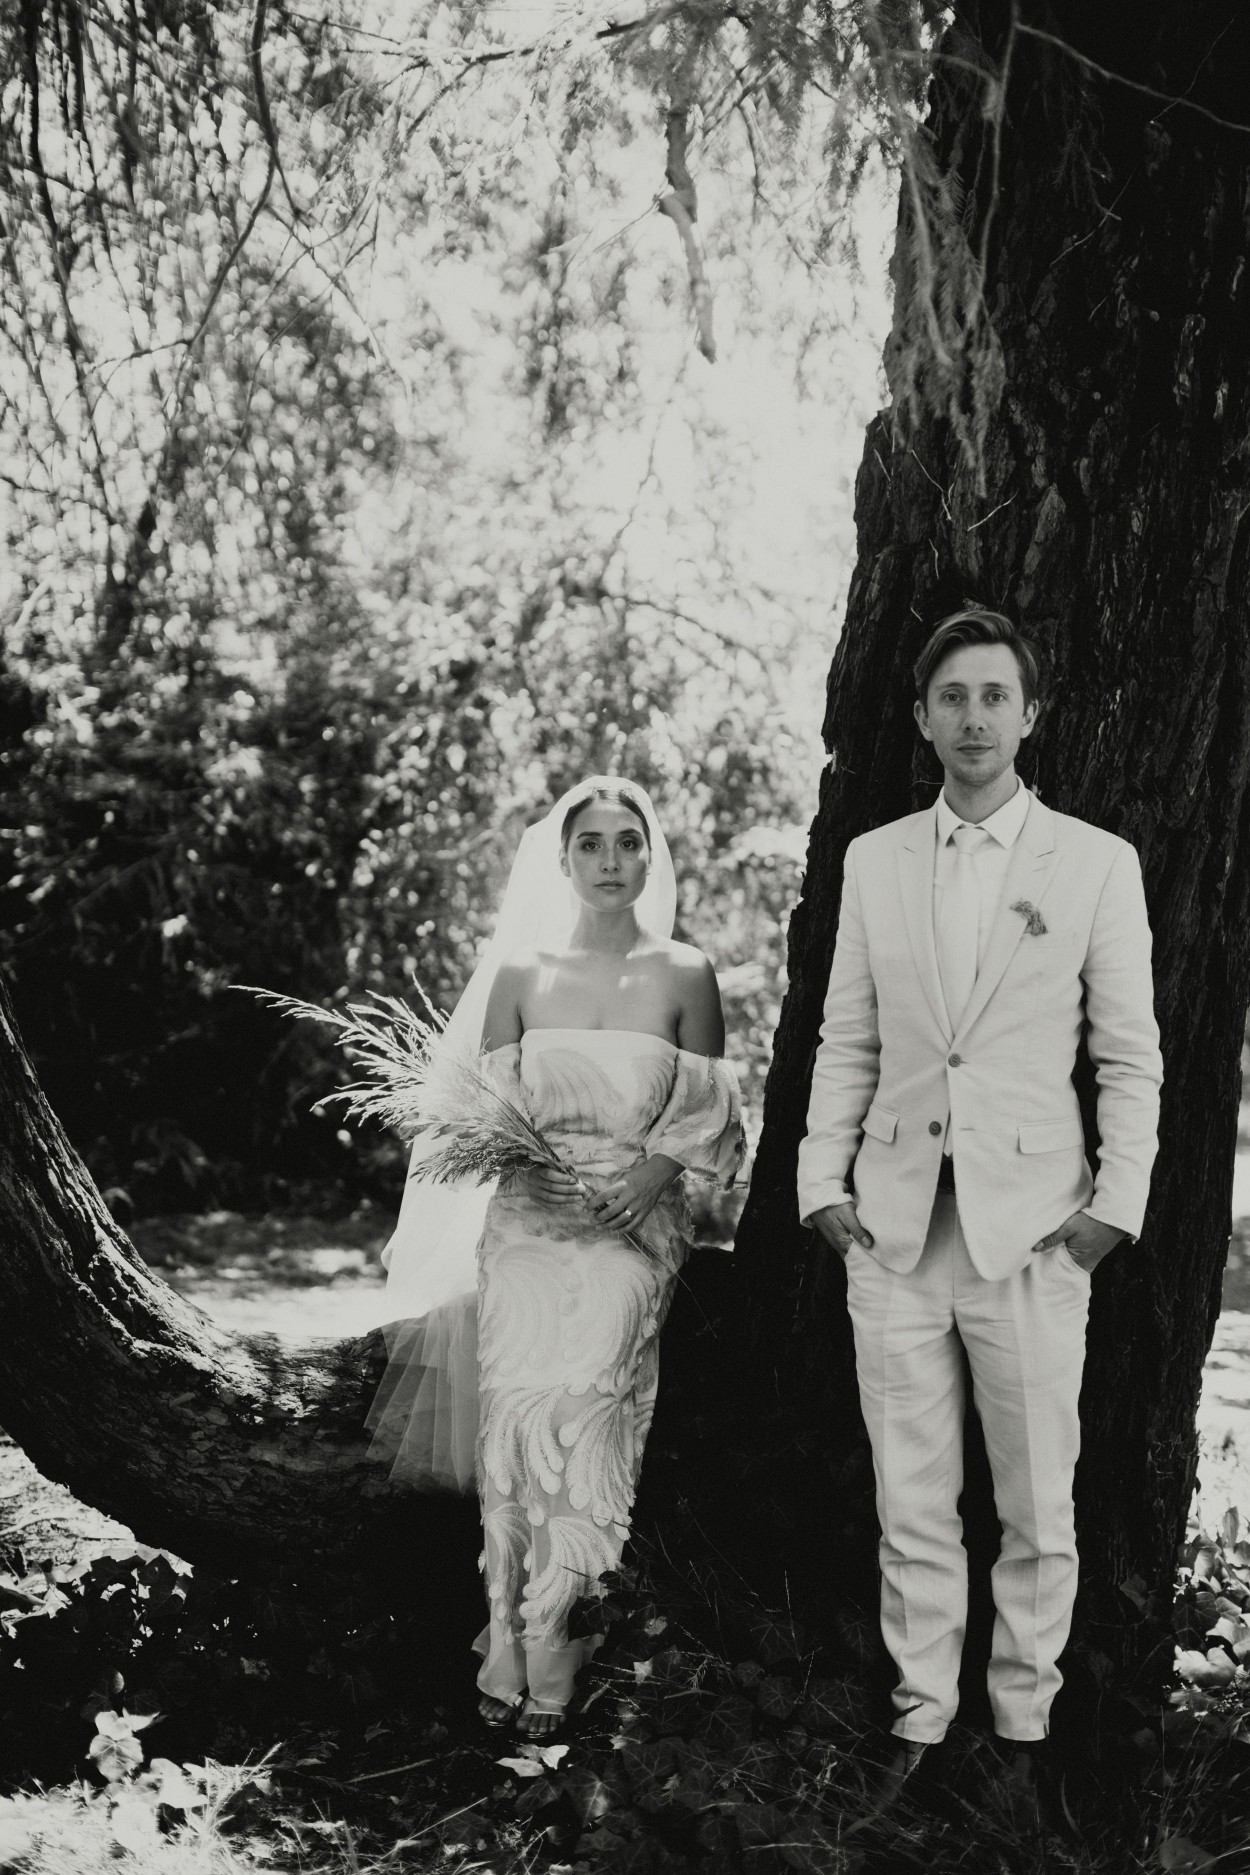 I-Got-You-Babe-Weddings-Heide-Museum-of-Modern-Art-Elopement-Susie-Nathan064.jpg